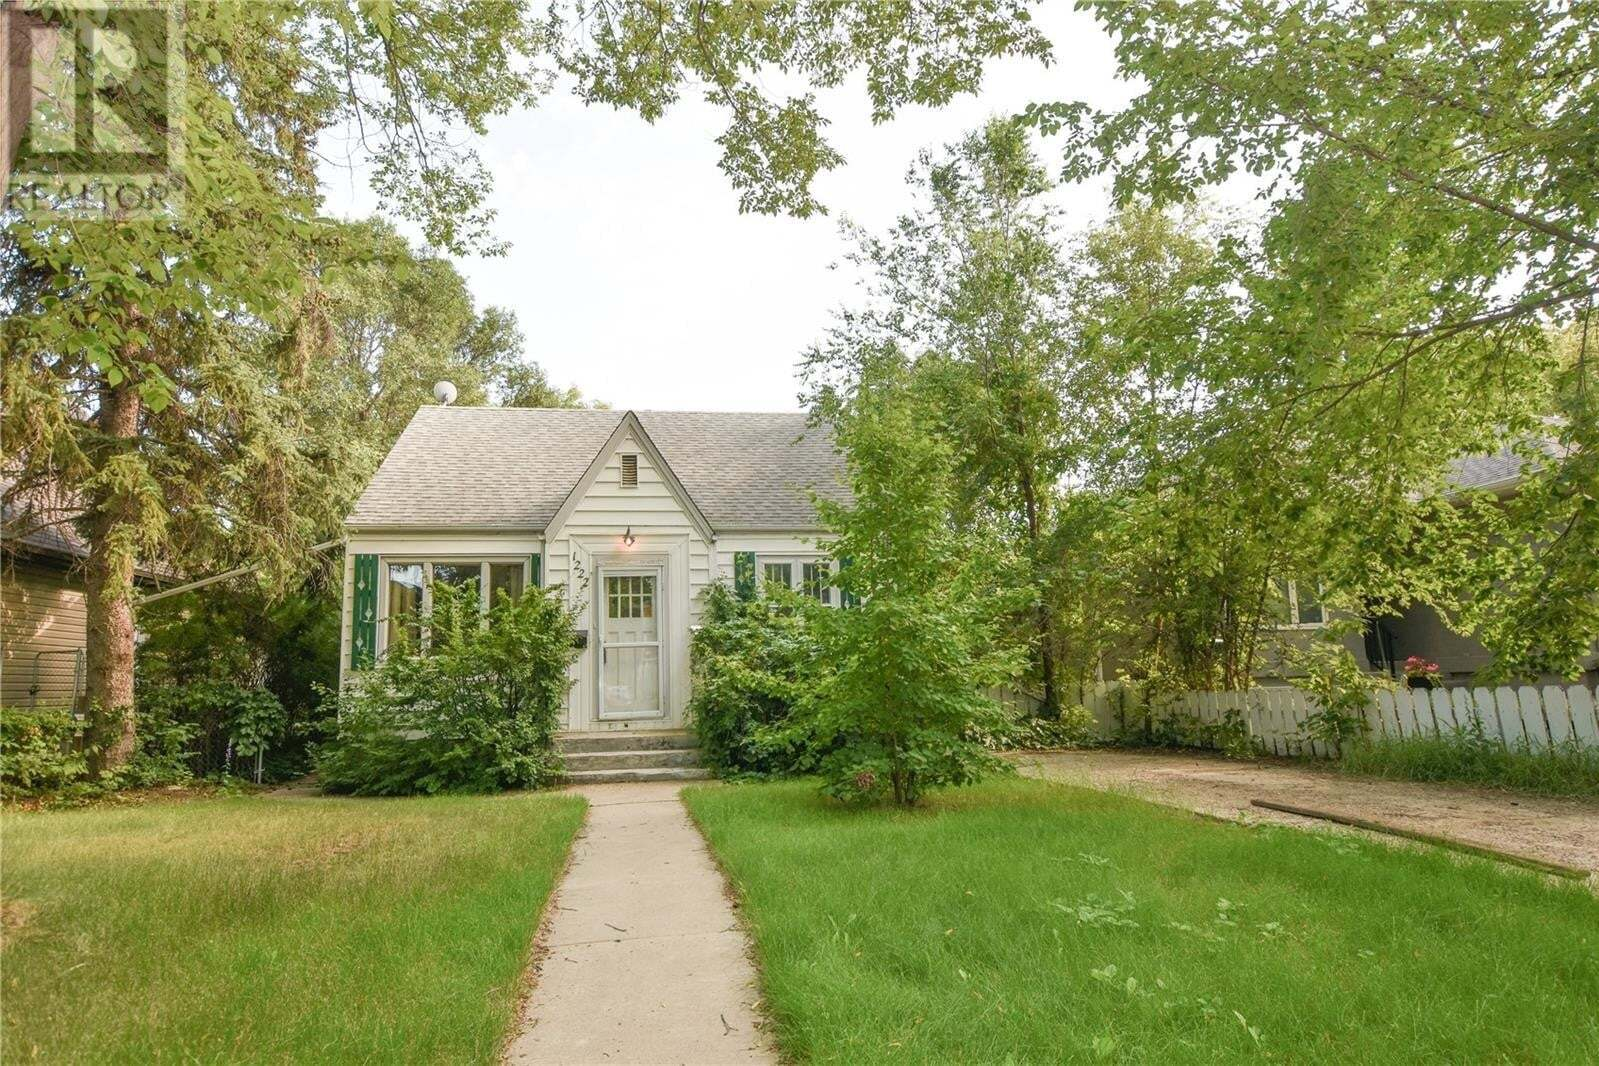 House for sale at 1222 15th St E Saskatoon Saskatchewan - MLS: SK818431